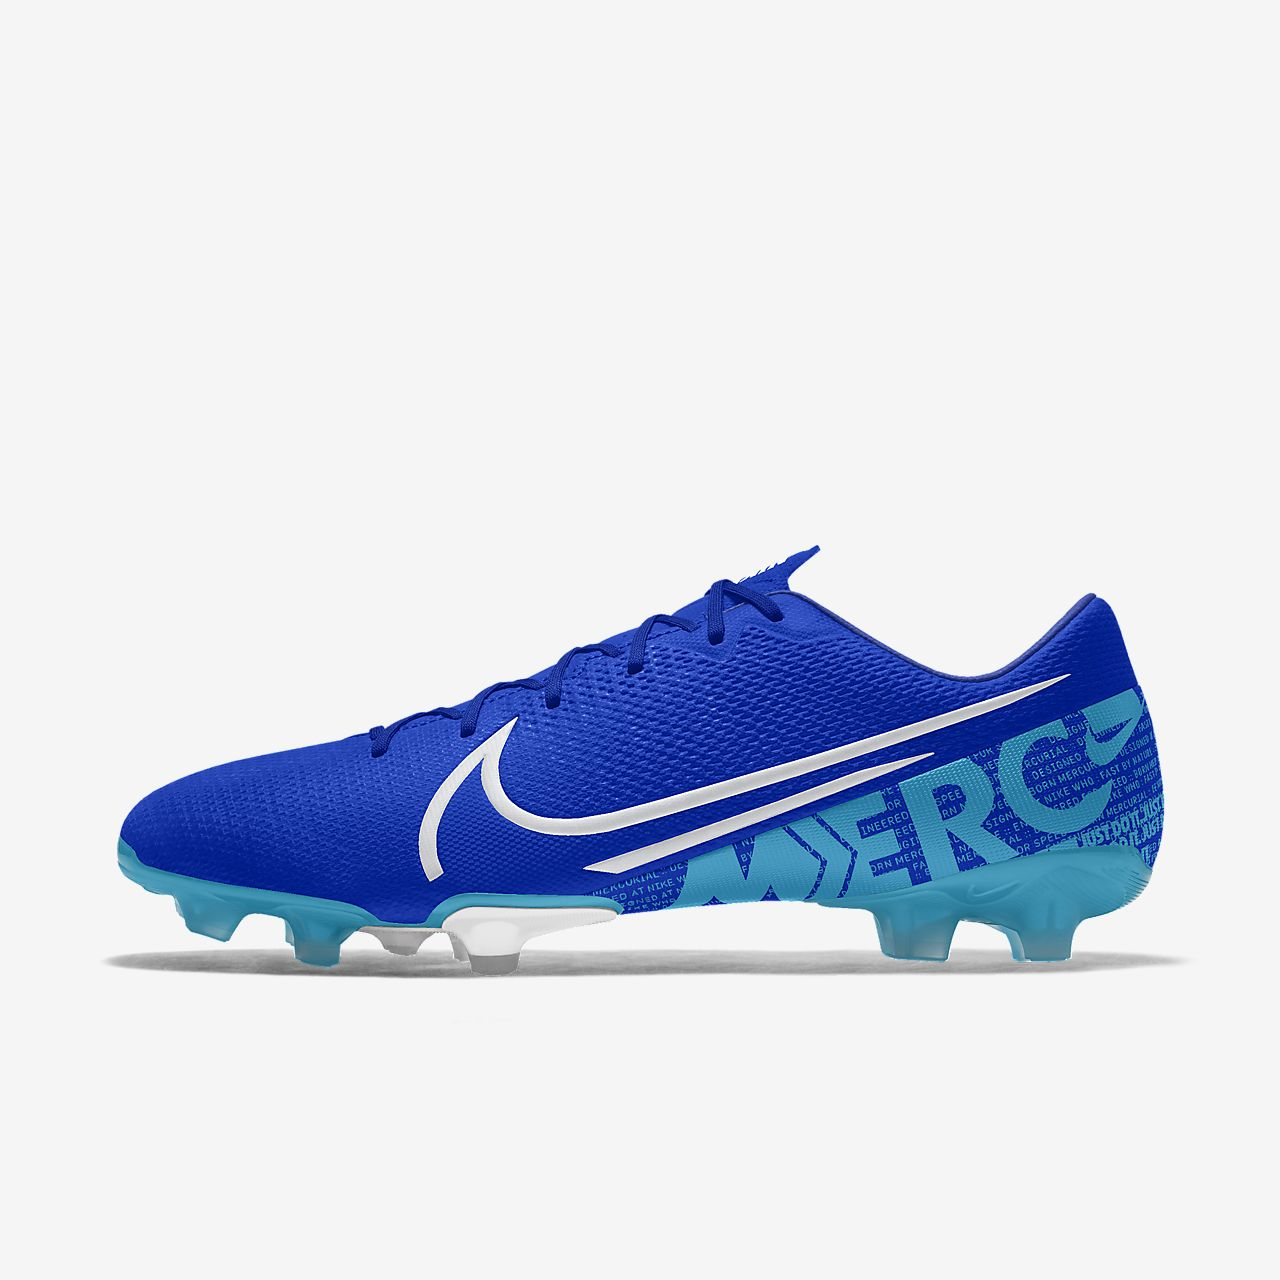 Specialdesignad fotbollssko för gräs Nike Mercurial Vapor 13 Academy FG By You